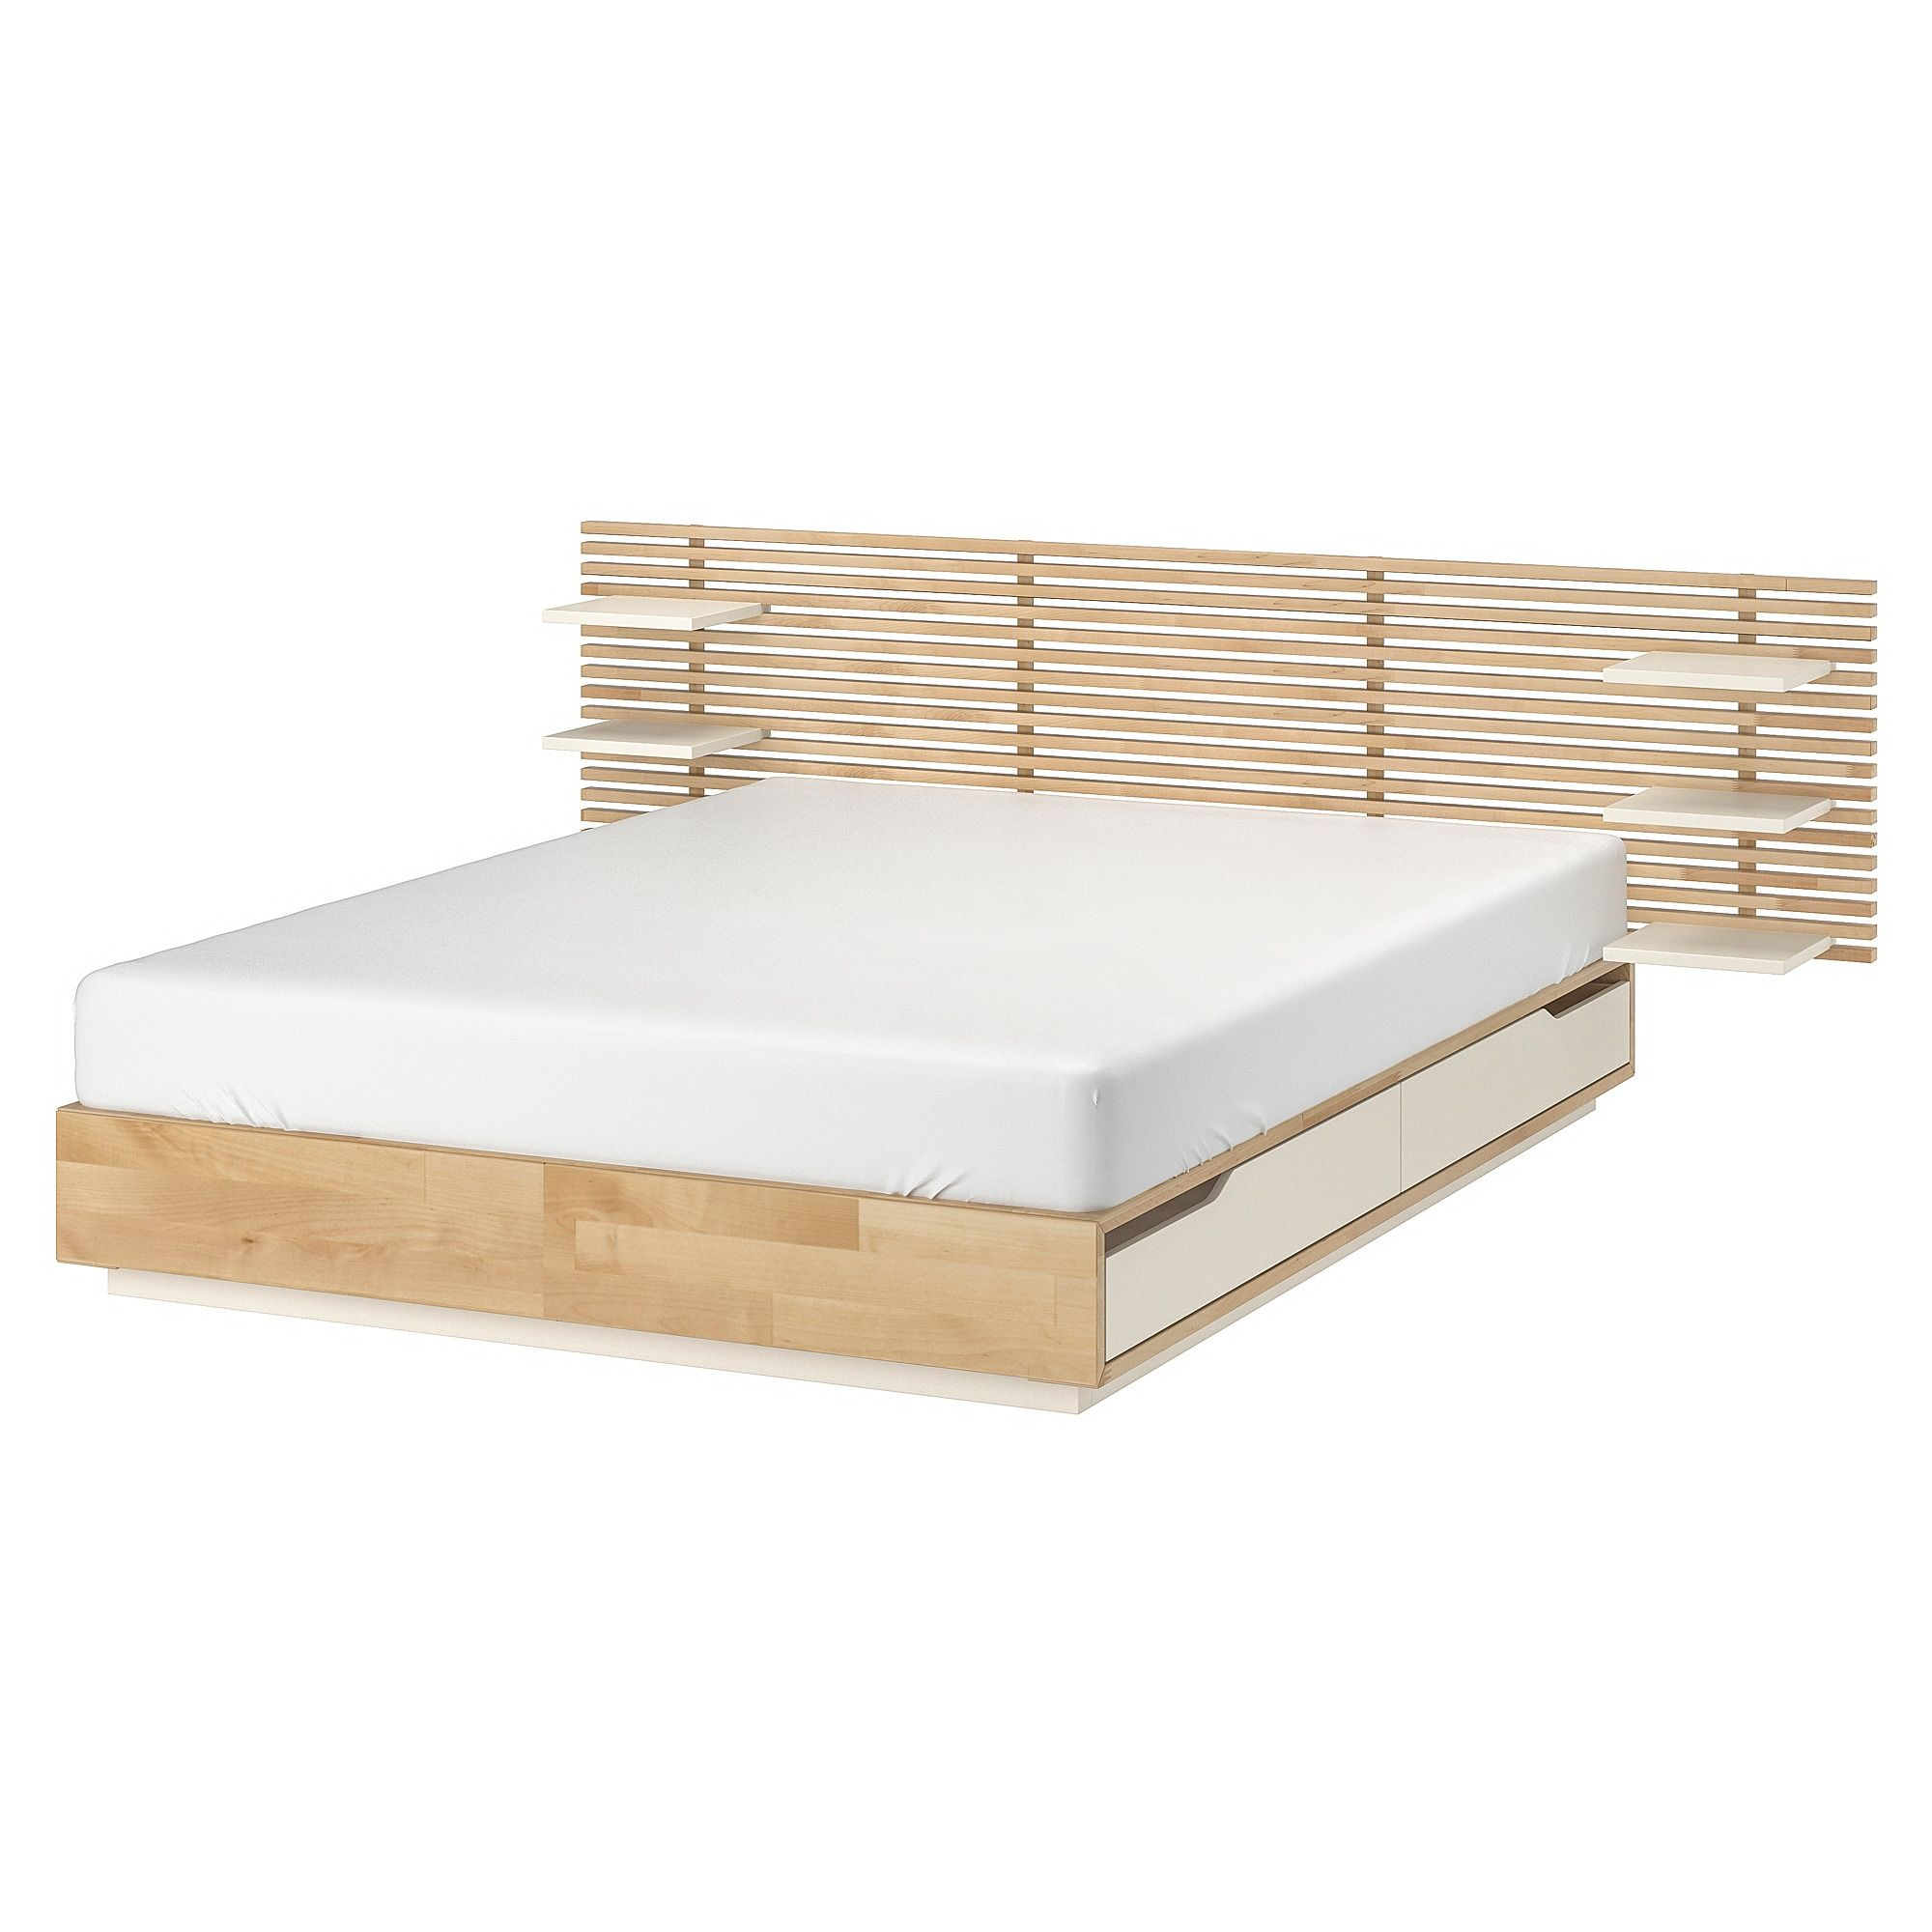 Mandal Structure Lit Avec Tete De Lit Bouleau Blanc 160x202 Cm Ikea Bed Frame And Headboard Mandal Bed Ikea Bed Slats